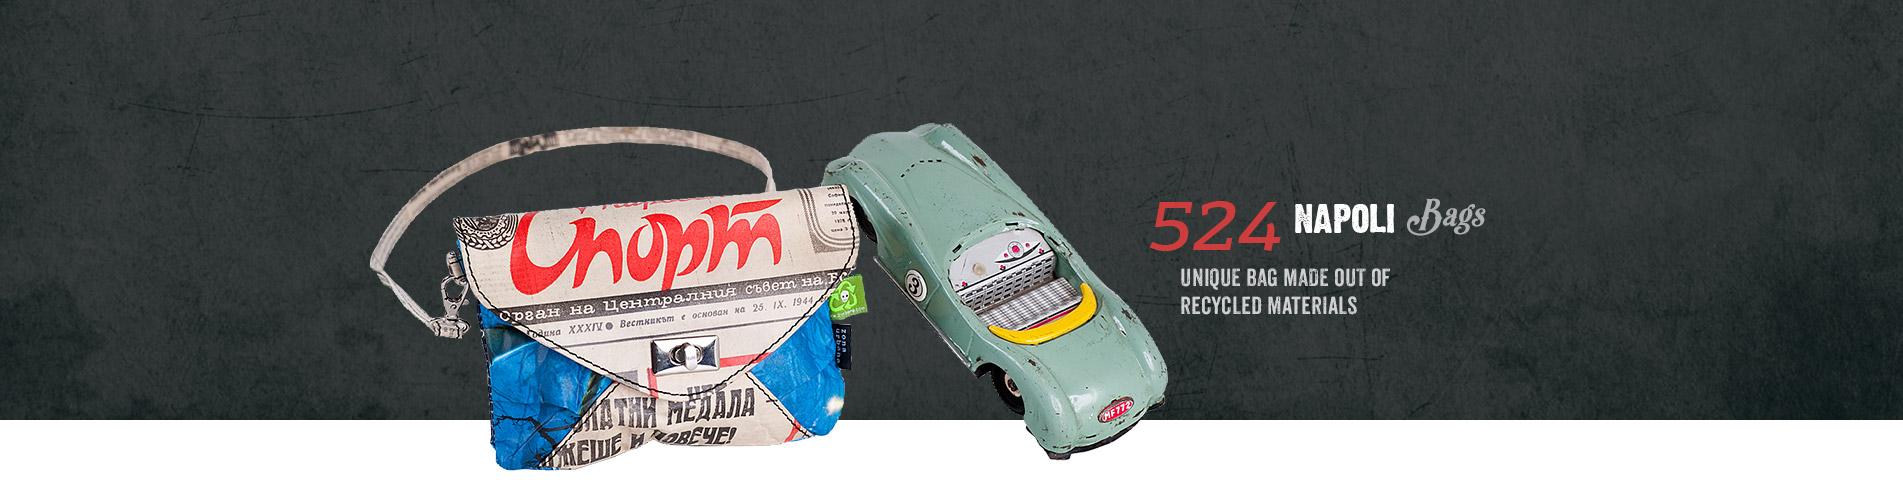 524 Napoli Bags